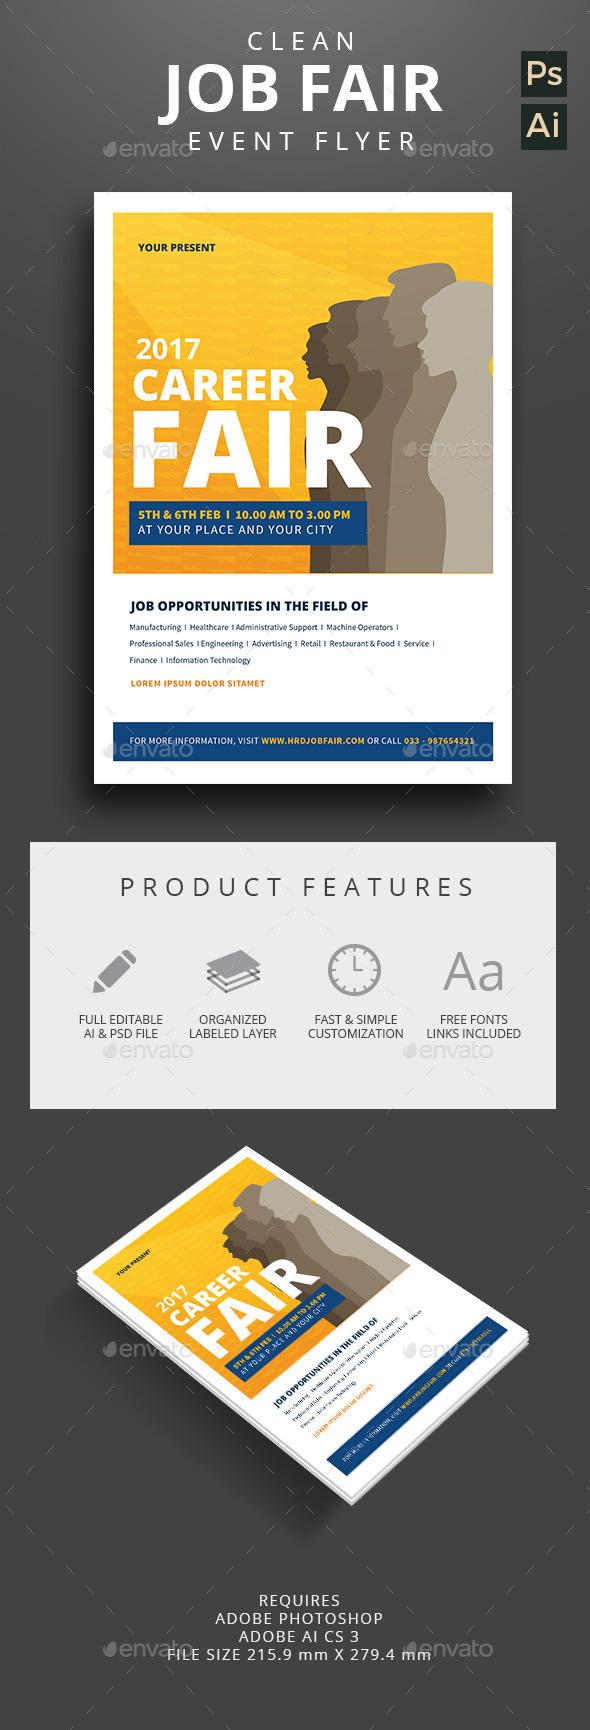 Clean Job Fair Event Flyer - Corporate Flyers